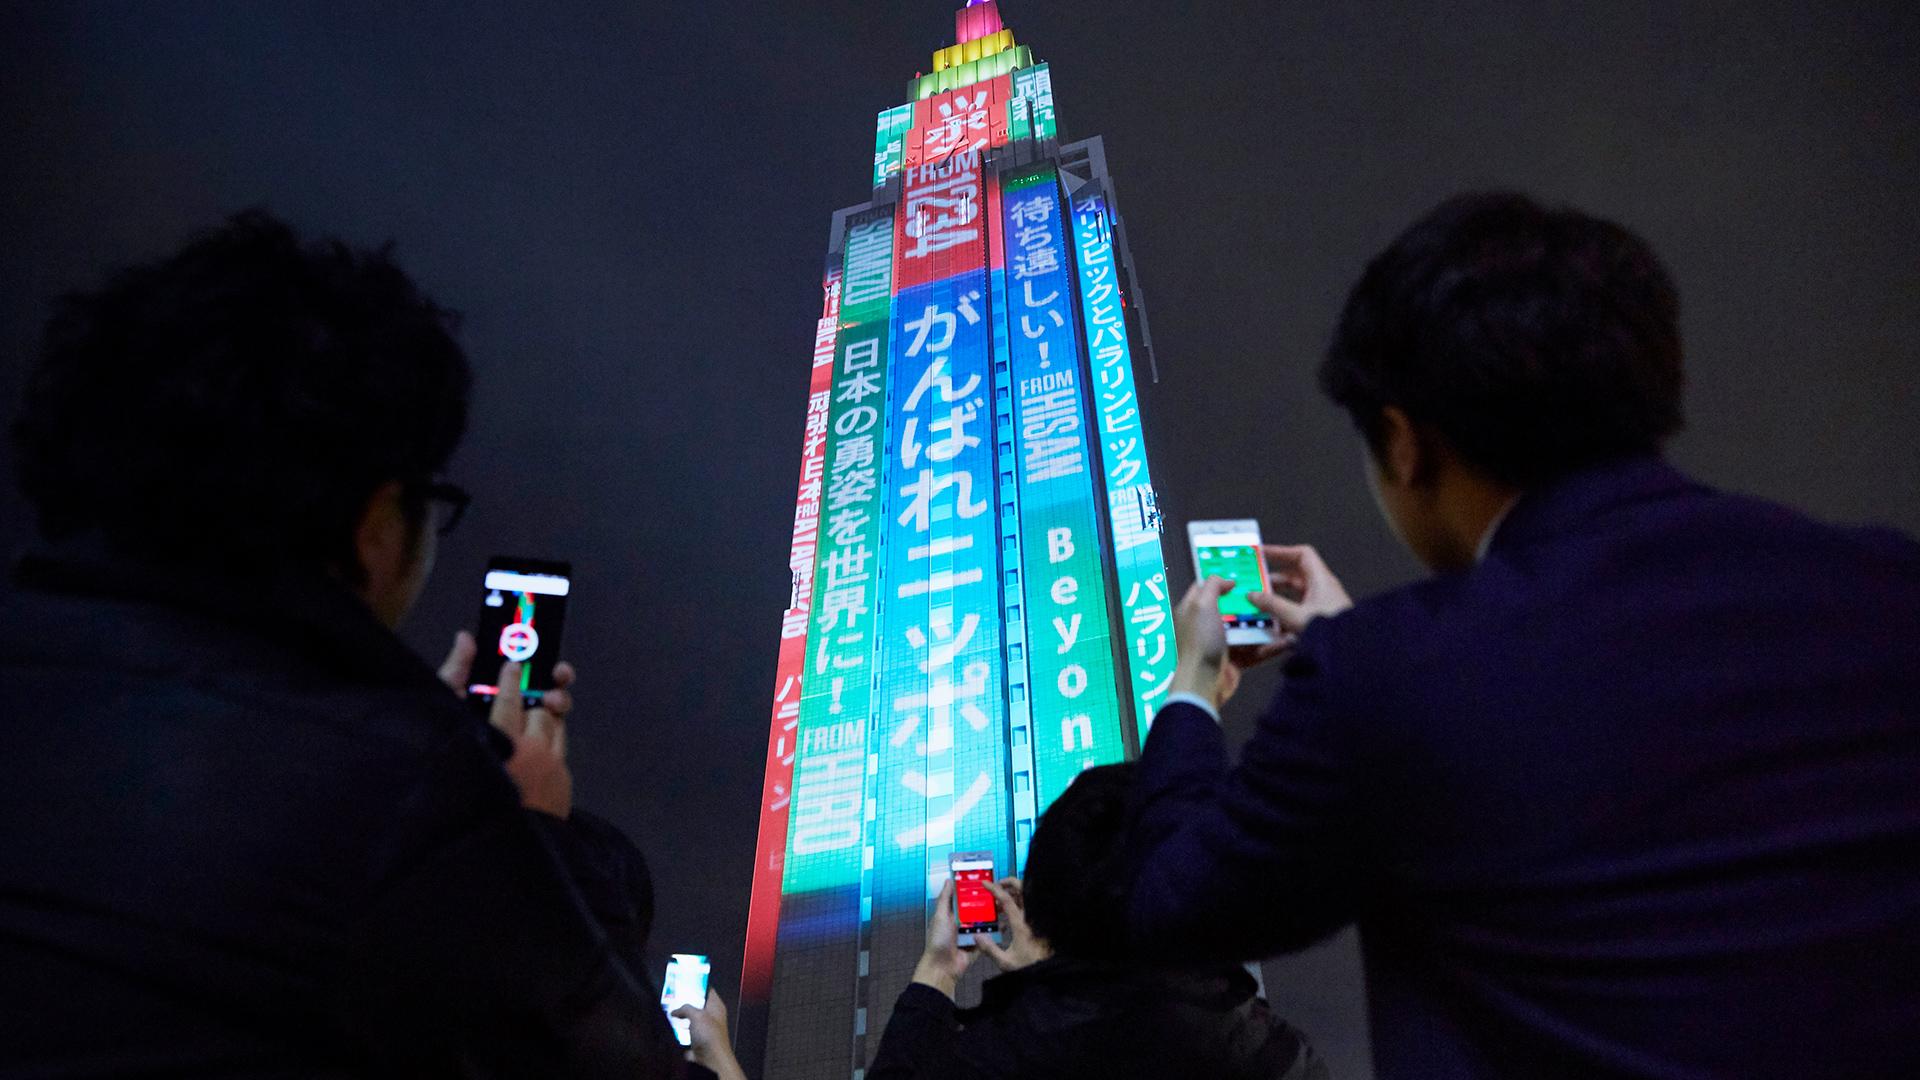 Yoyogi Candle 2020 Projection Mapping